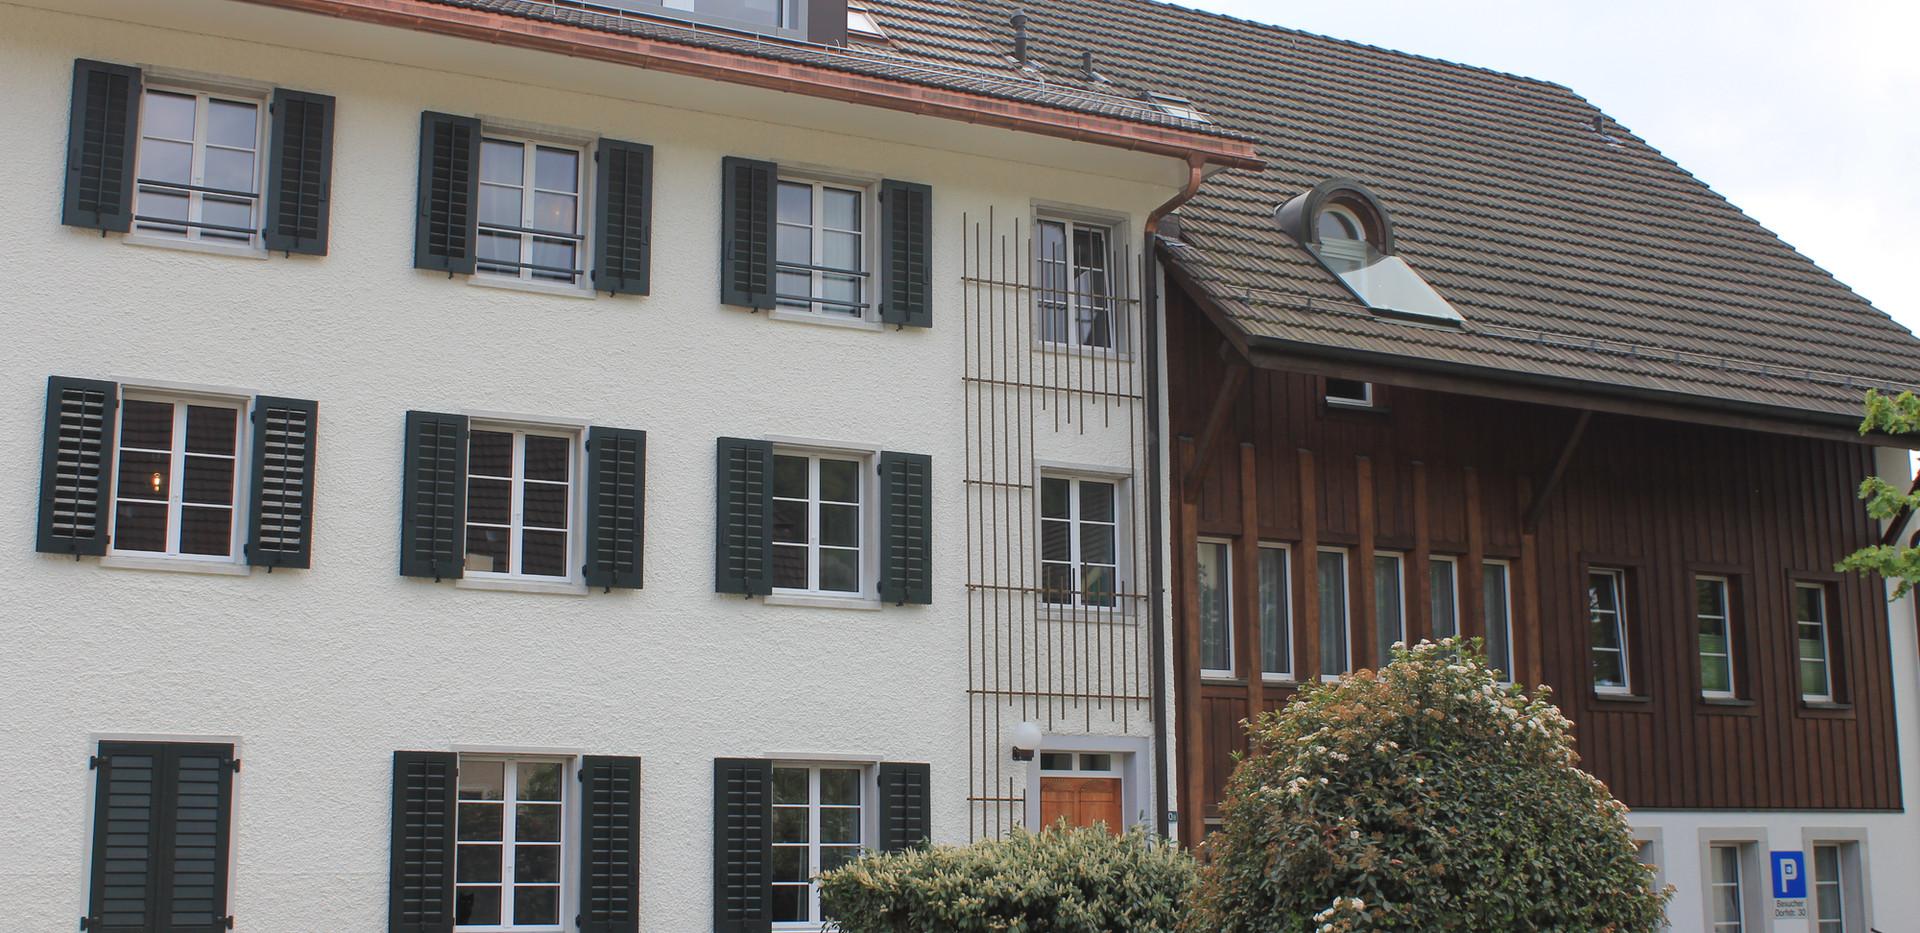 Dorfstrasse 30a